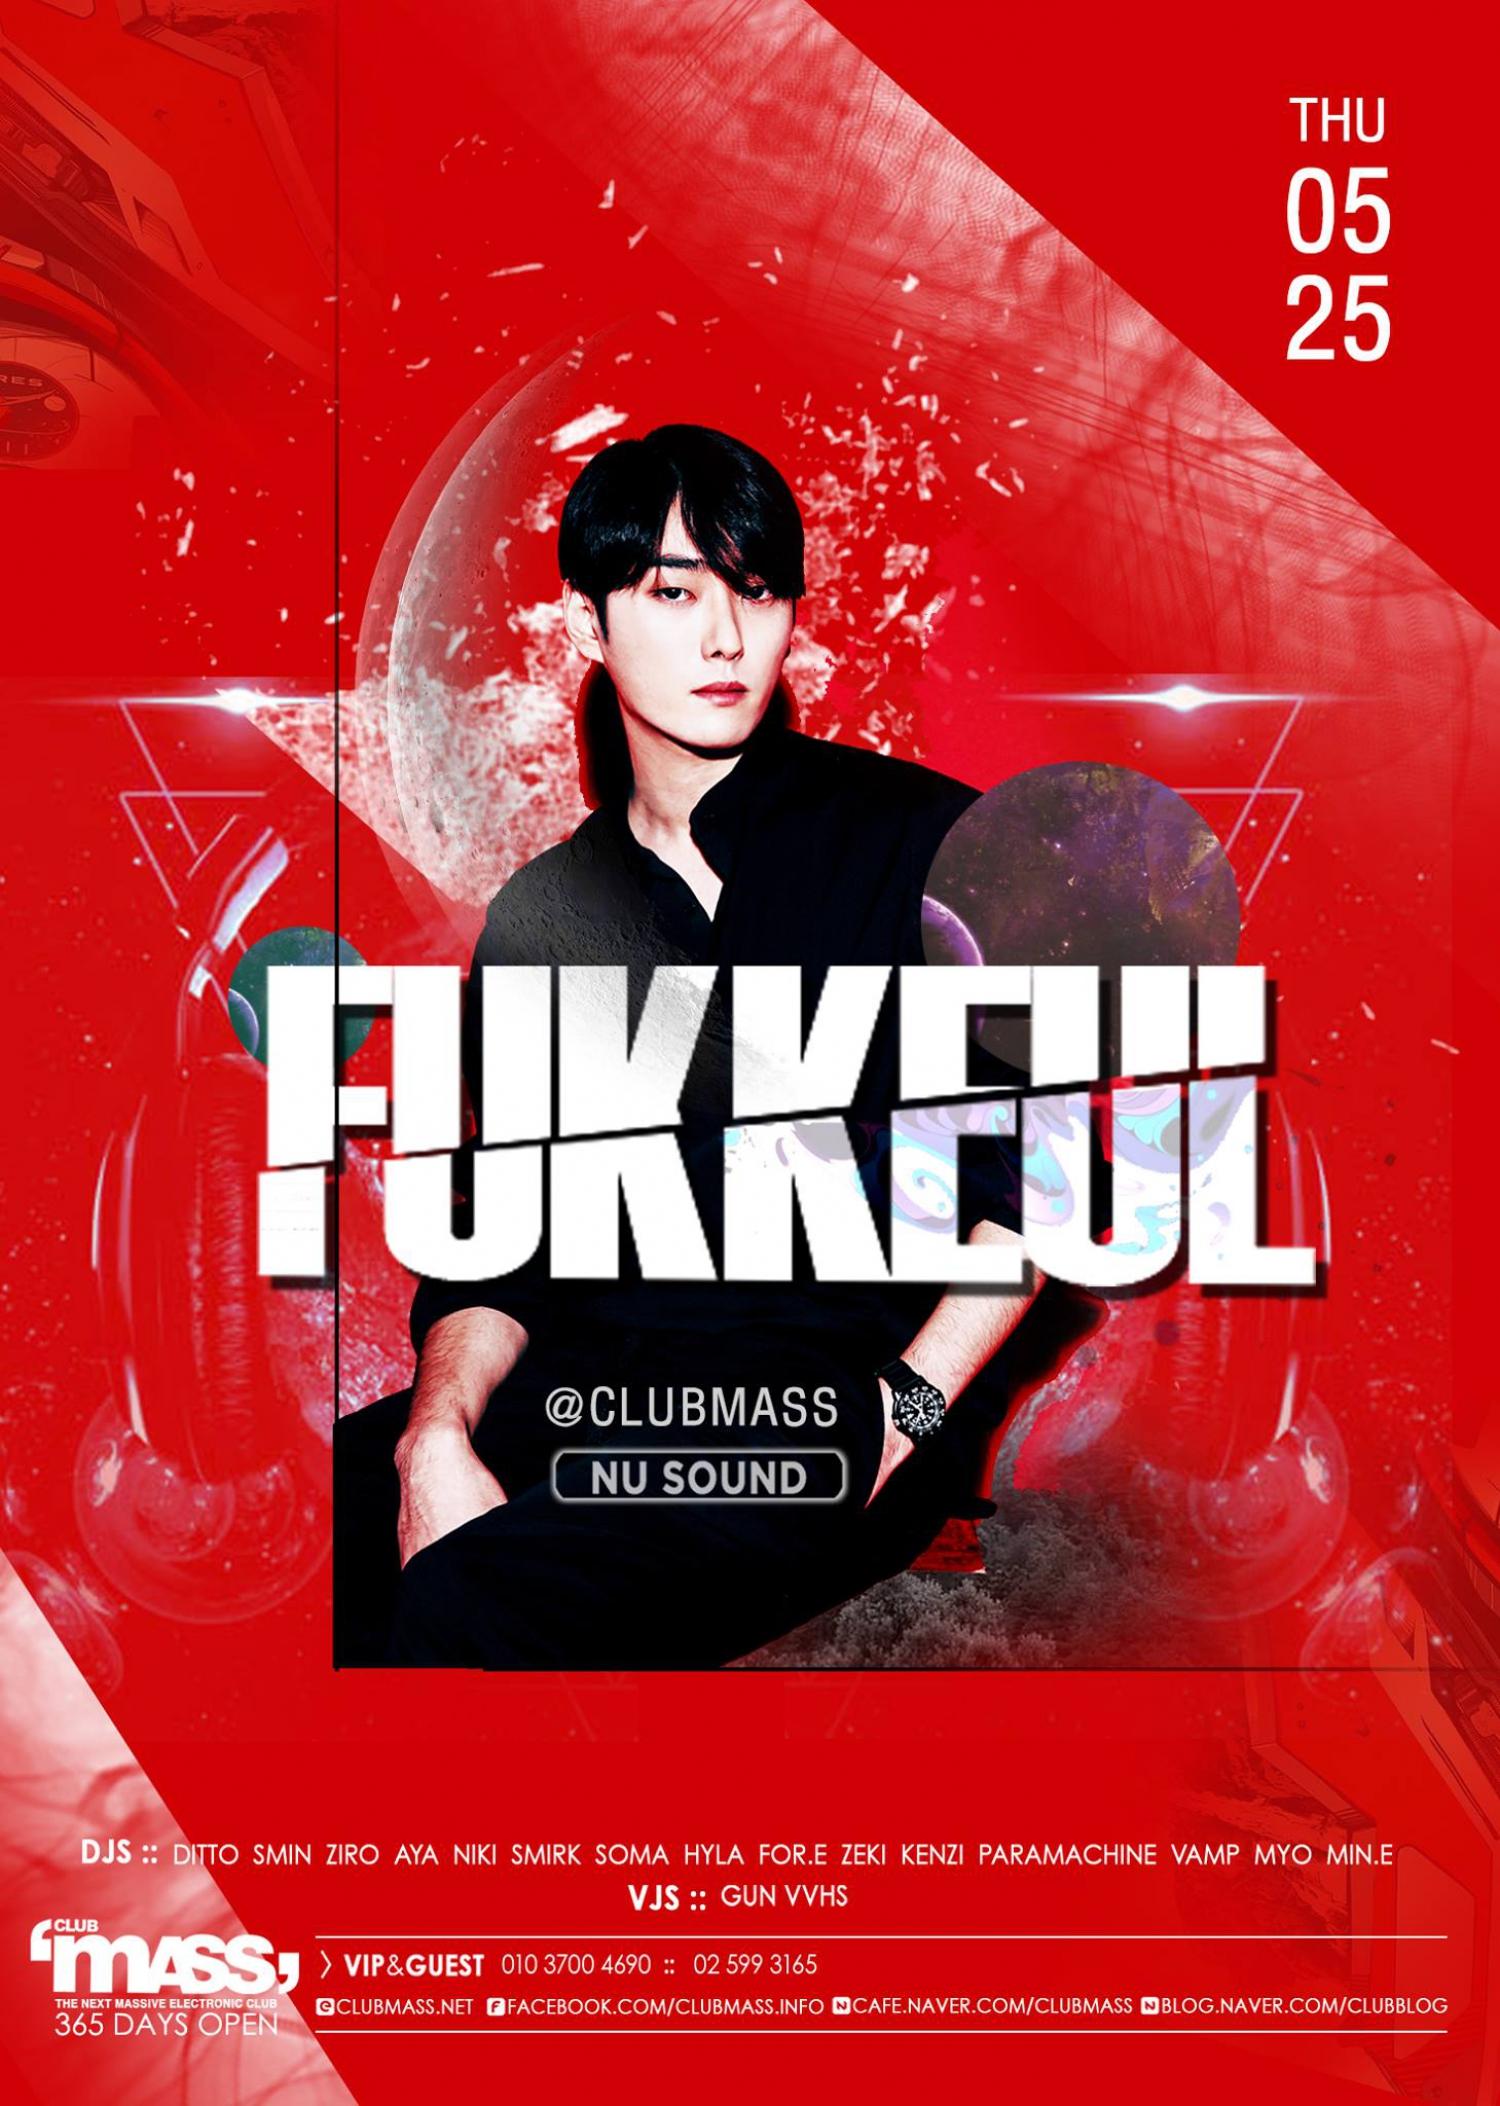 NUSOUND PARTY GUEST DJ FUKKEUL